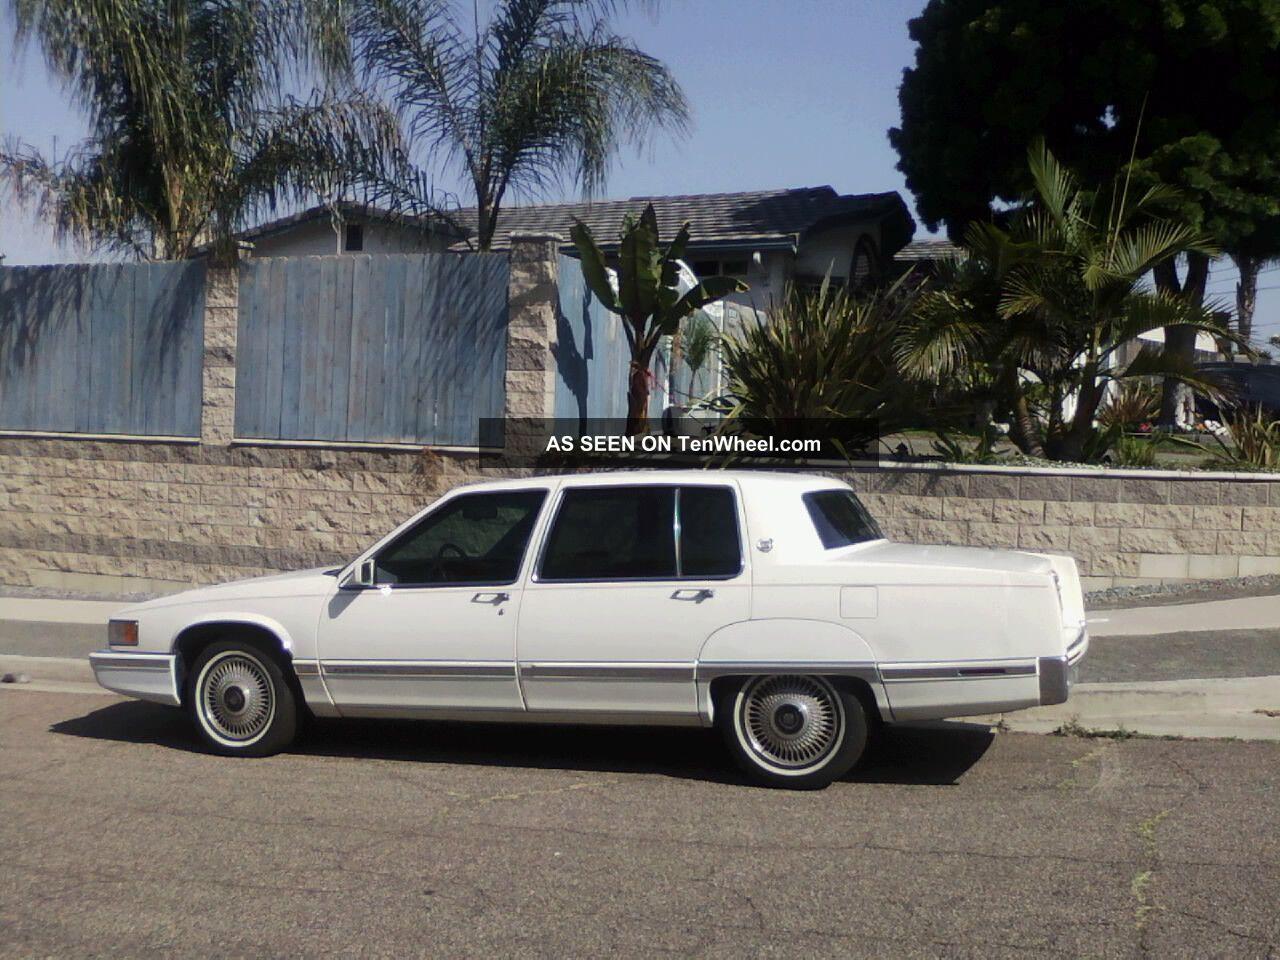 Cadillac Fleetwood Special Sedan Door L Lgw on 1992 Cadillac Fleetwood Sixty Special